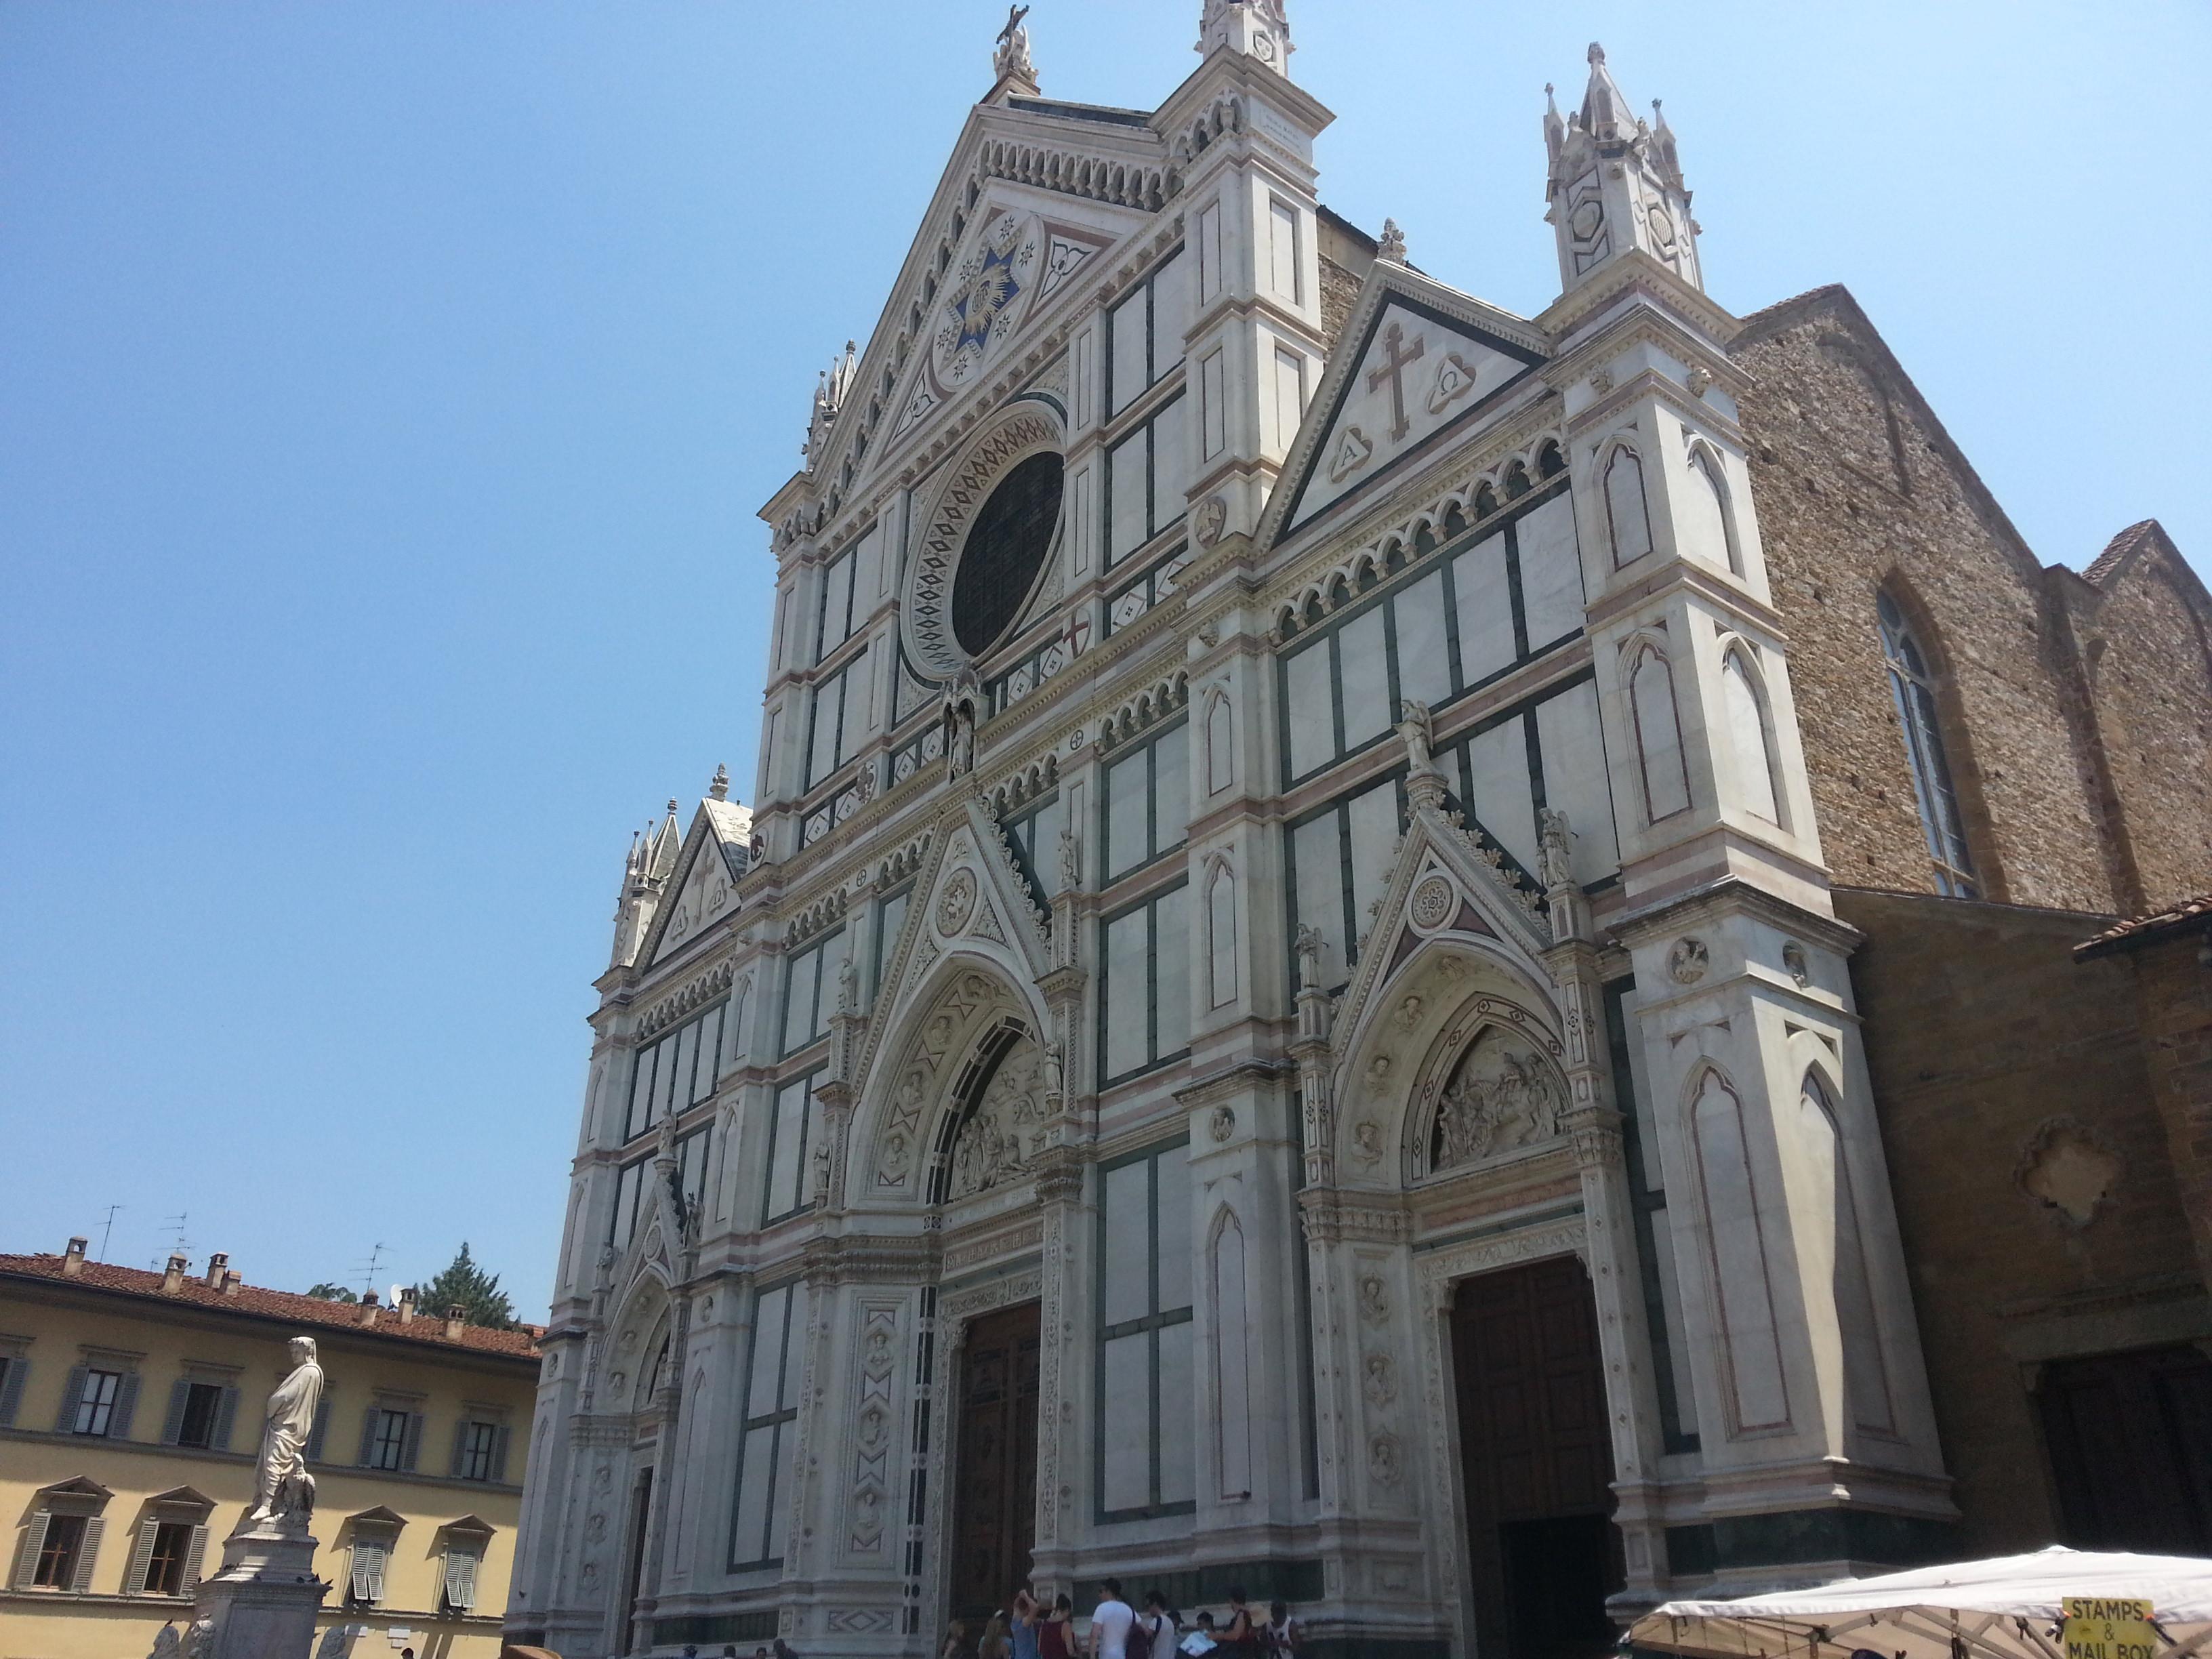 Firenze la storia scritta in Santa Croce